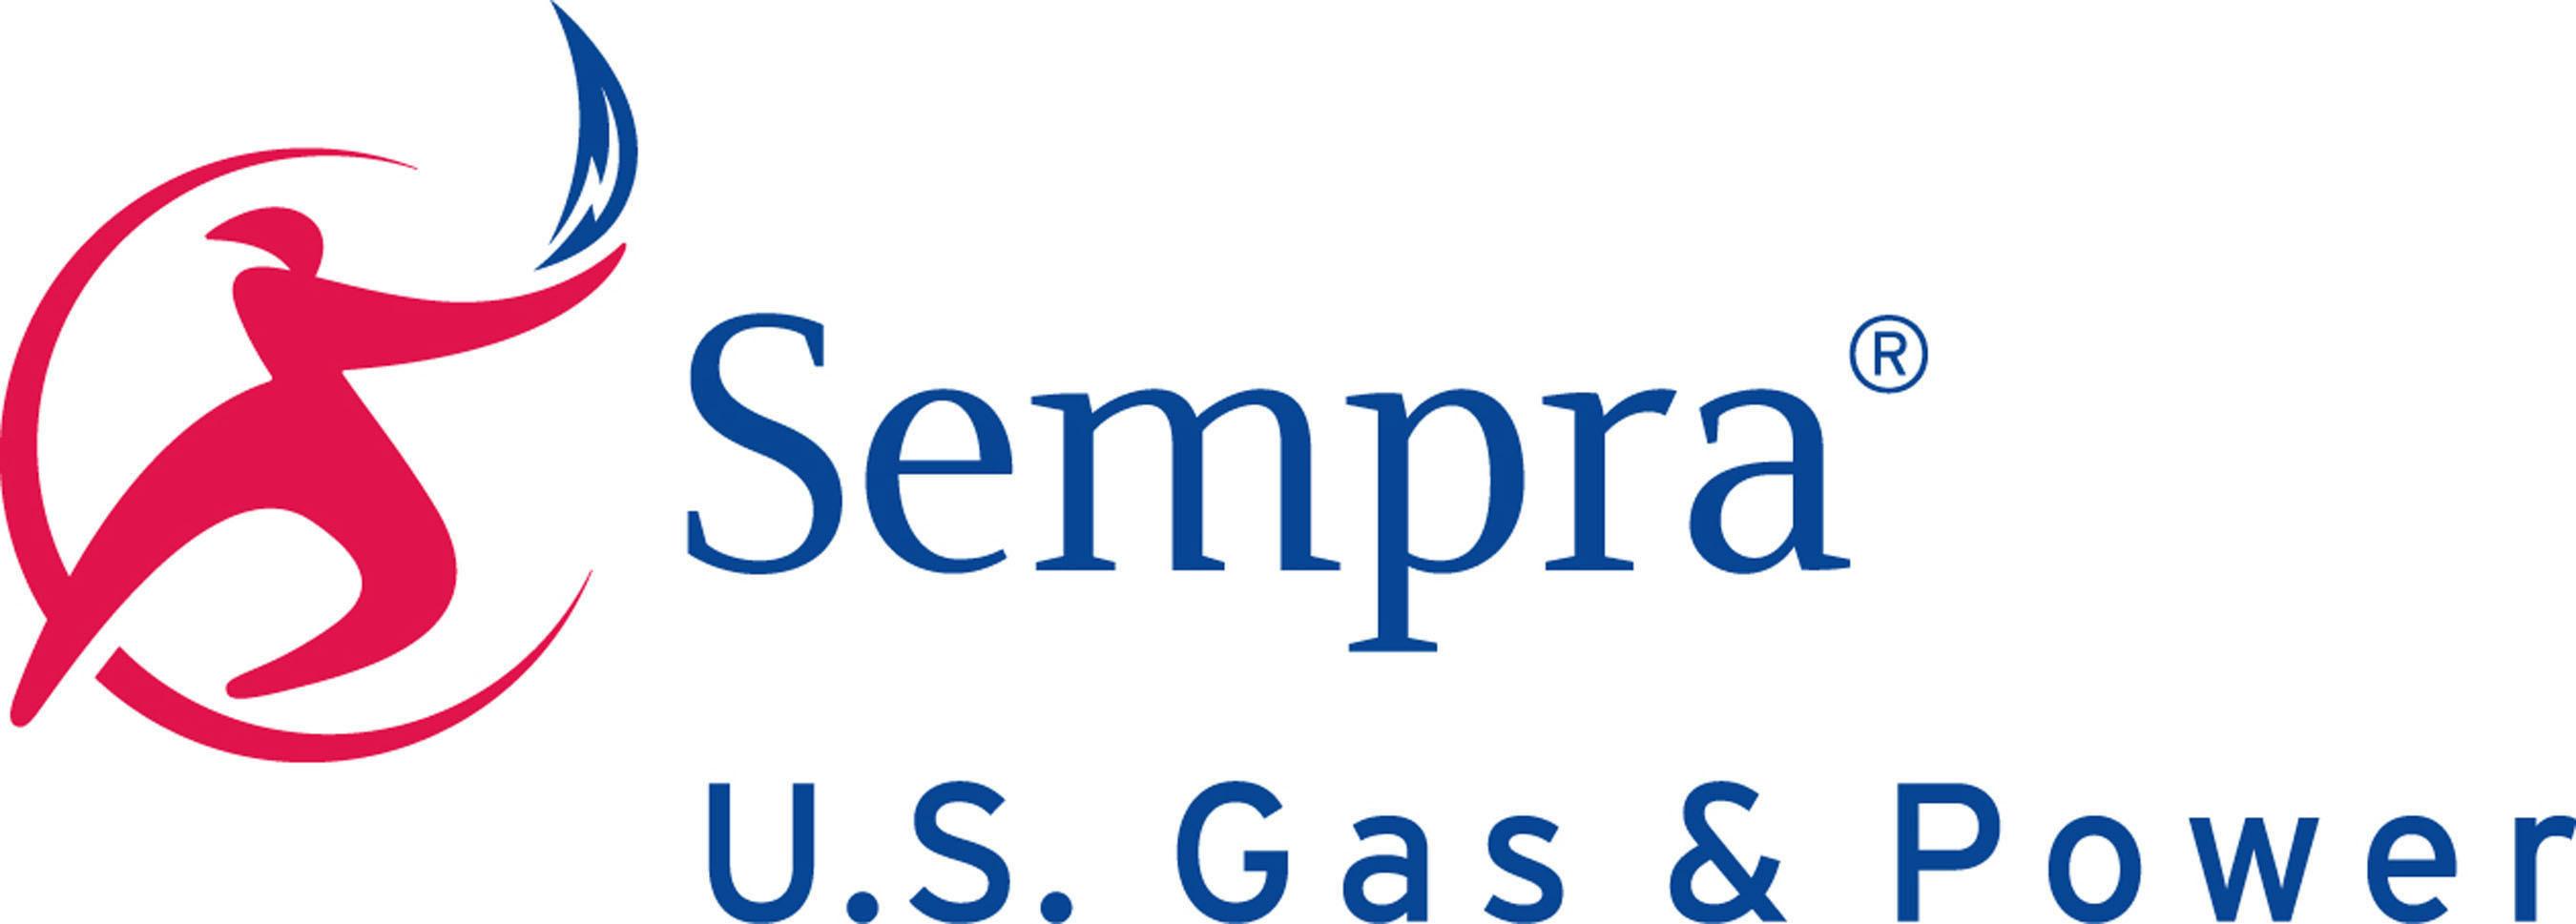 Sempra U.S. Gas & Power. (PRNewsFoto/Sempra U.S. Gas & Power)